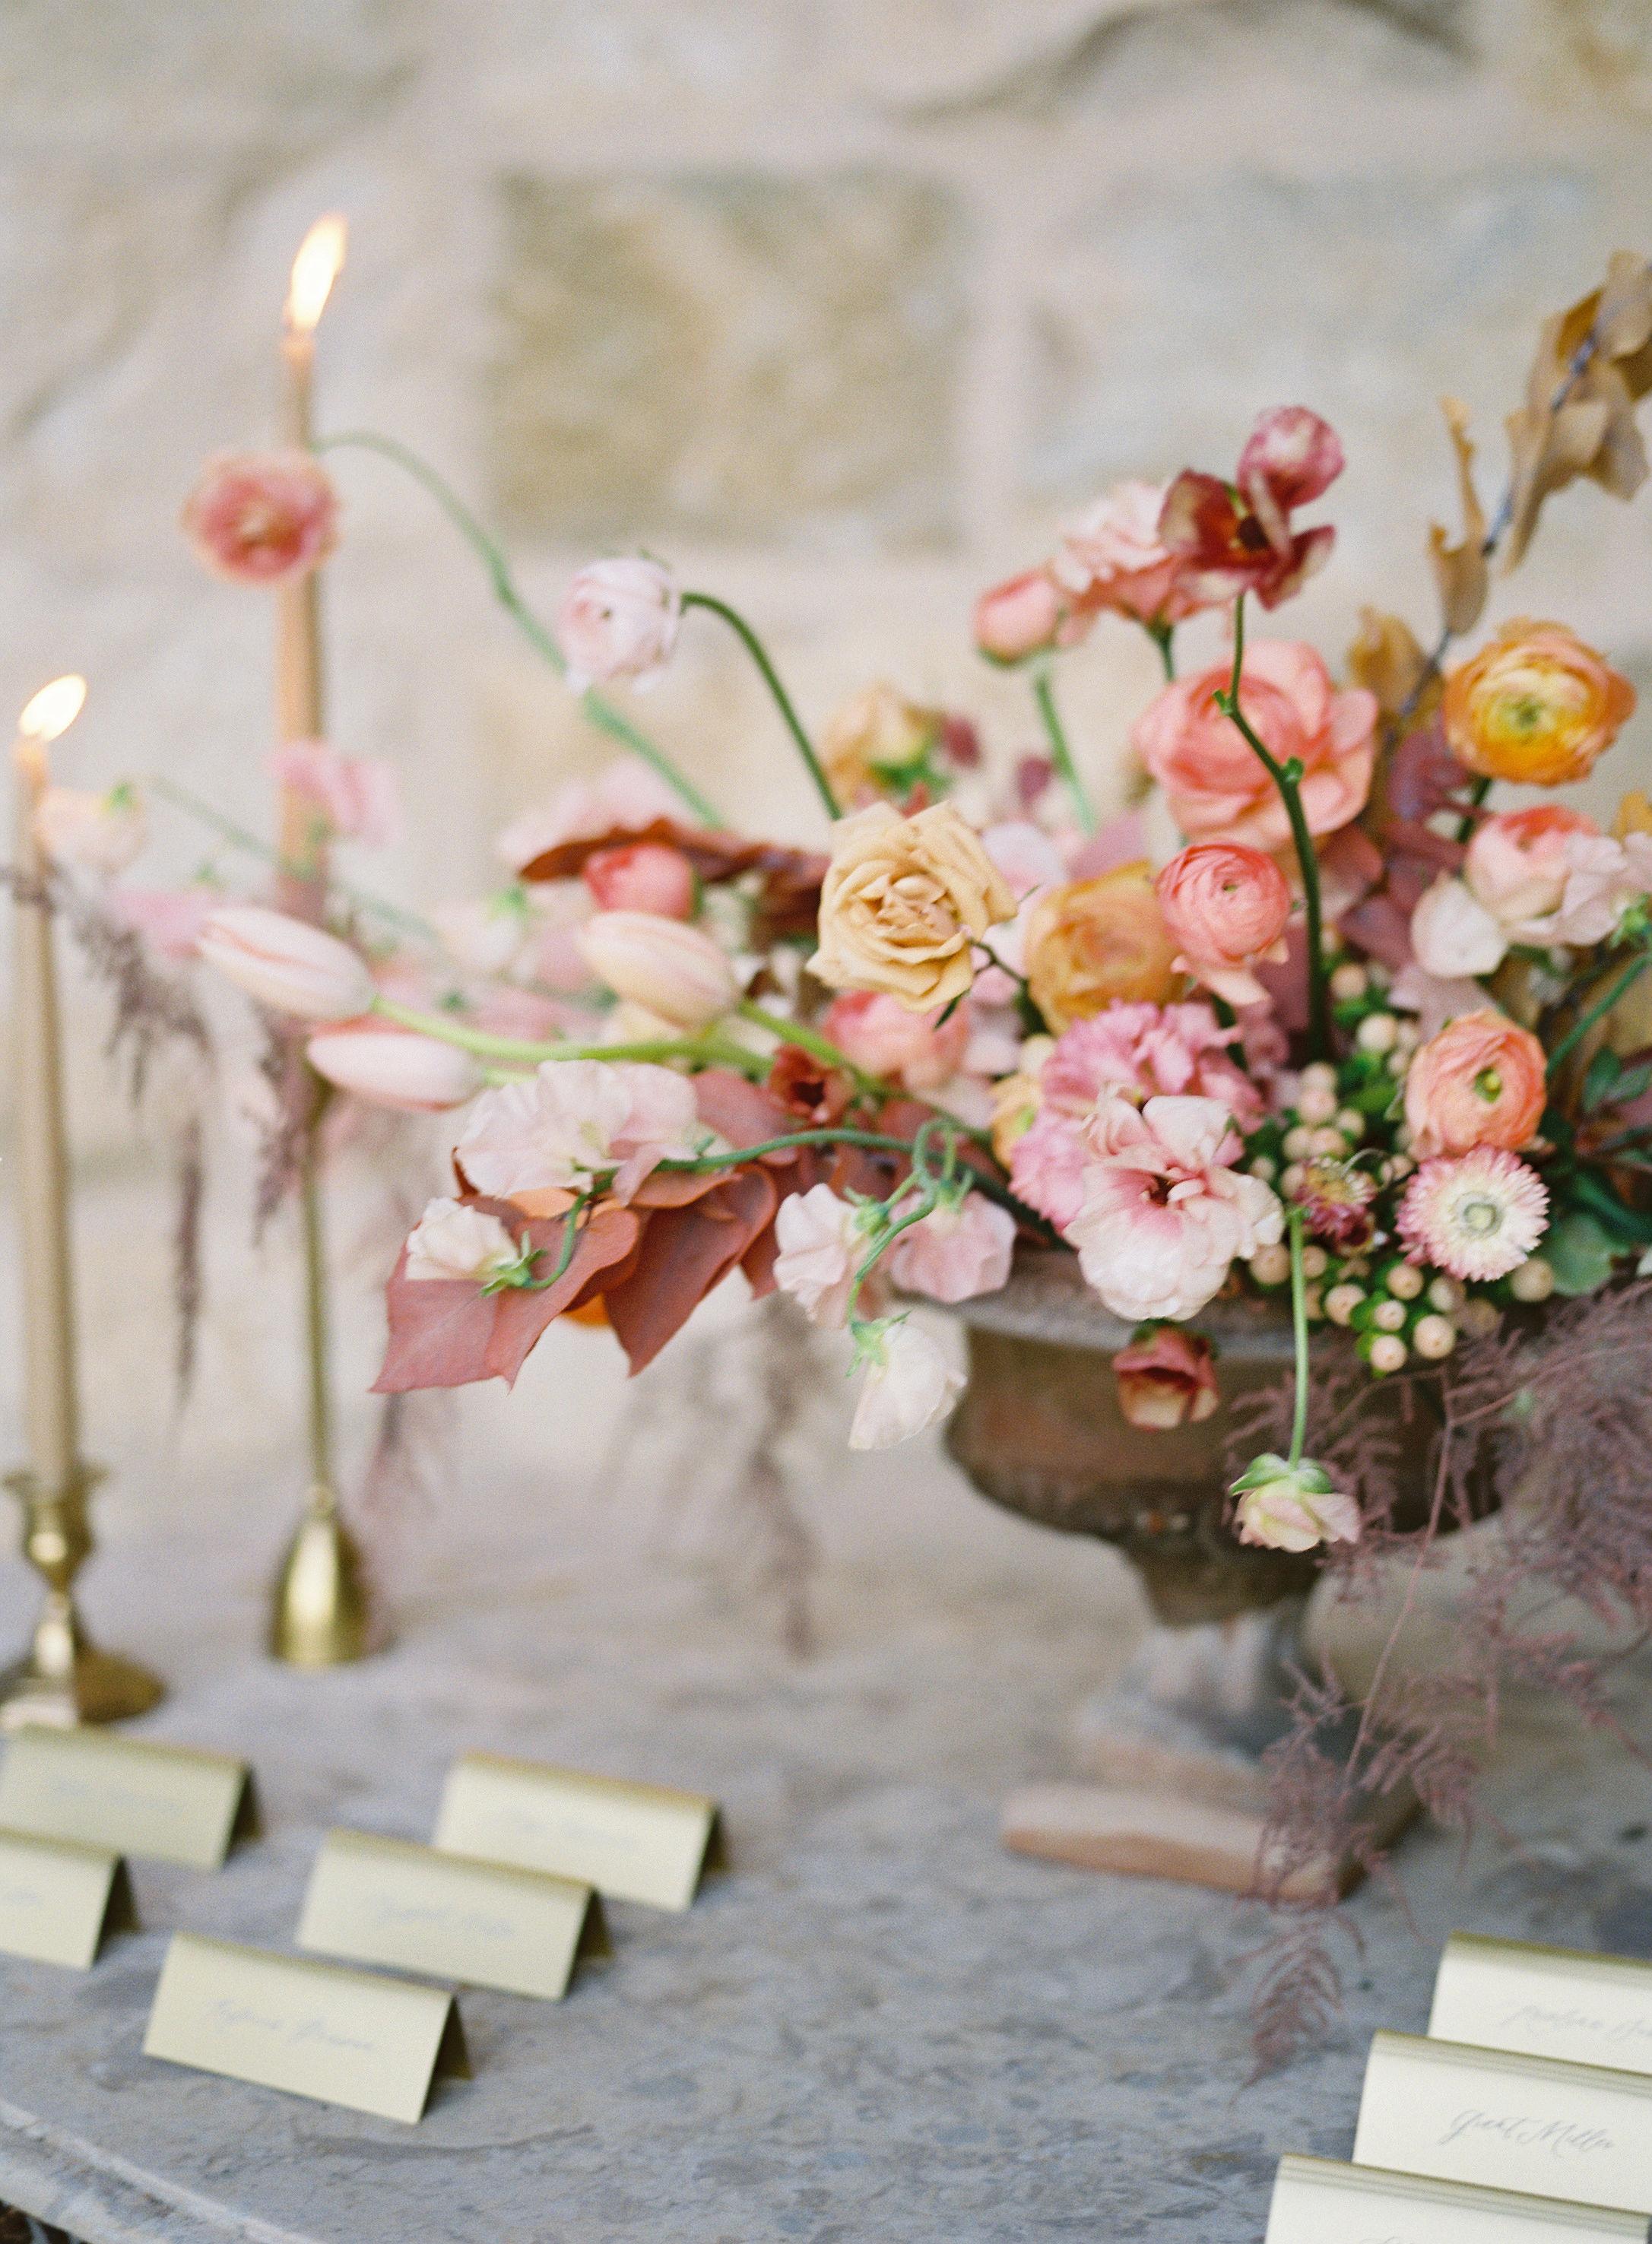 jessica-zimmerman-events-sunstone-floral-arrangement-organic.jpg